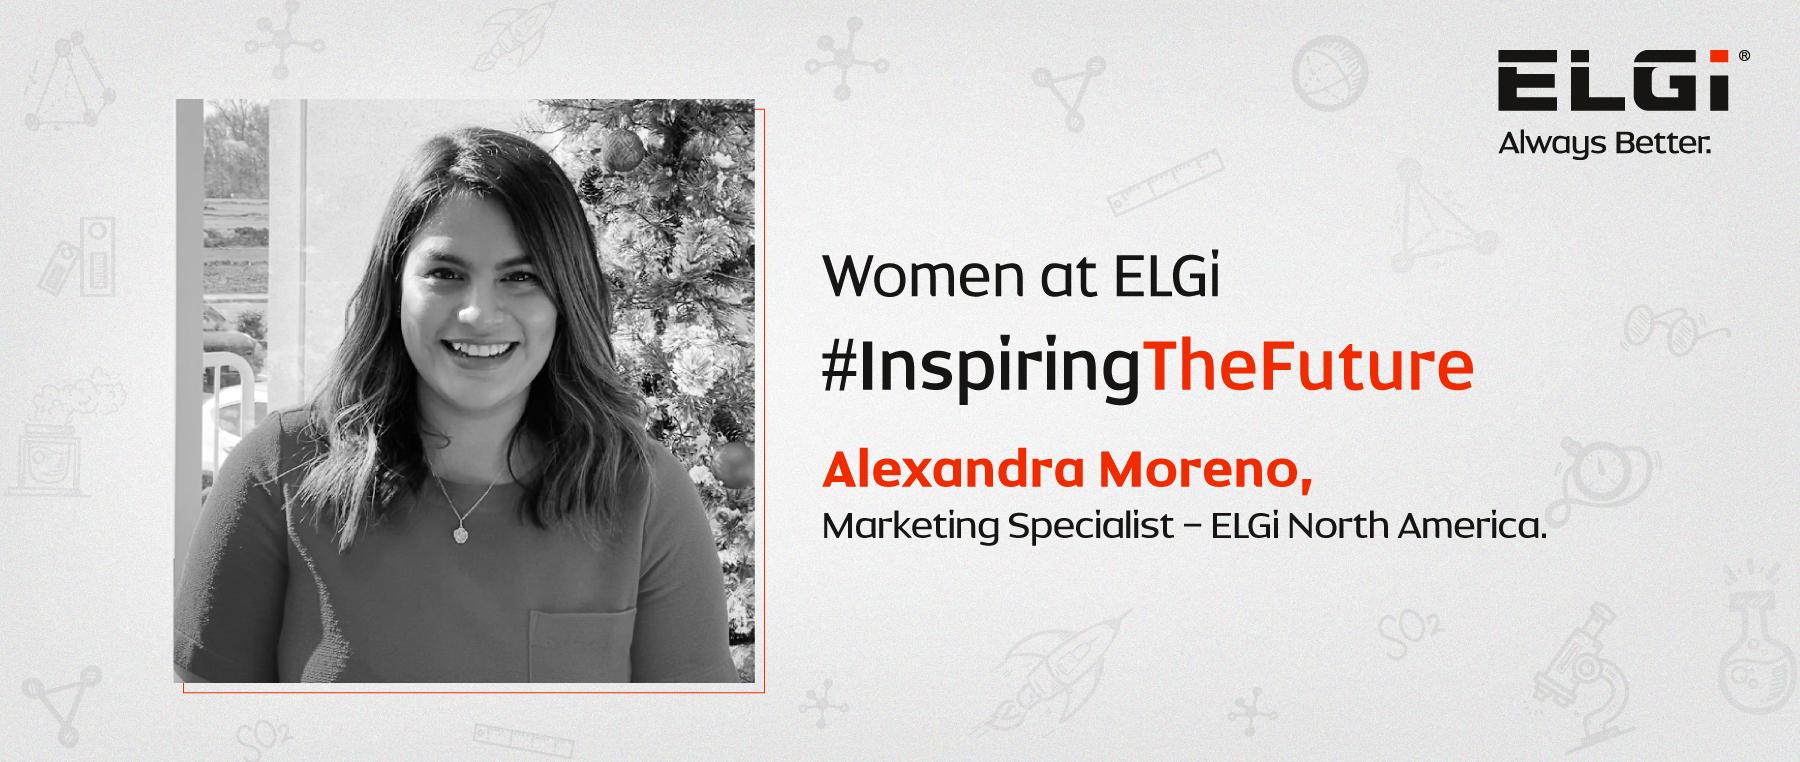 Women at ELGi #InspiringTheFuture – Alexandra Moreno